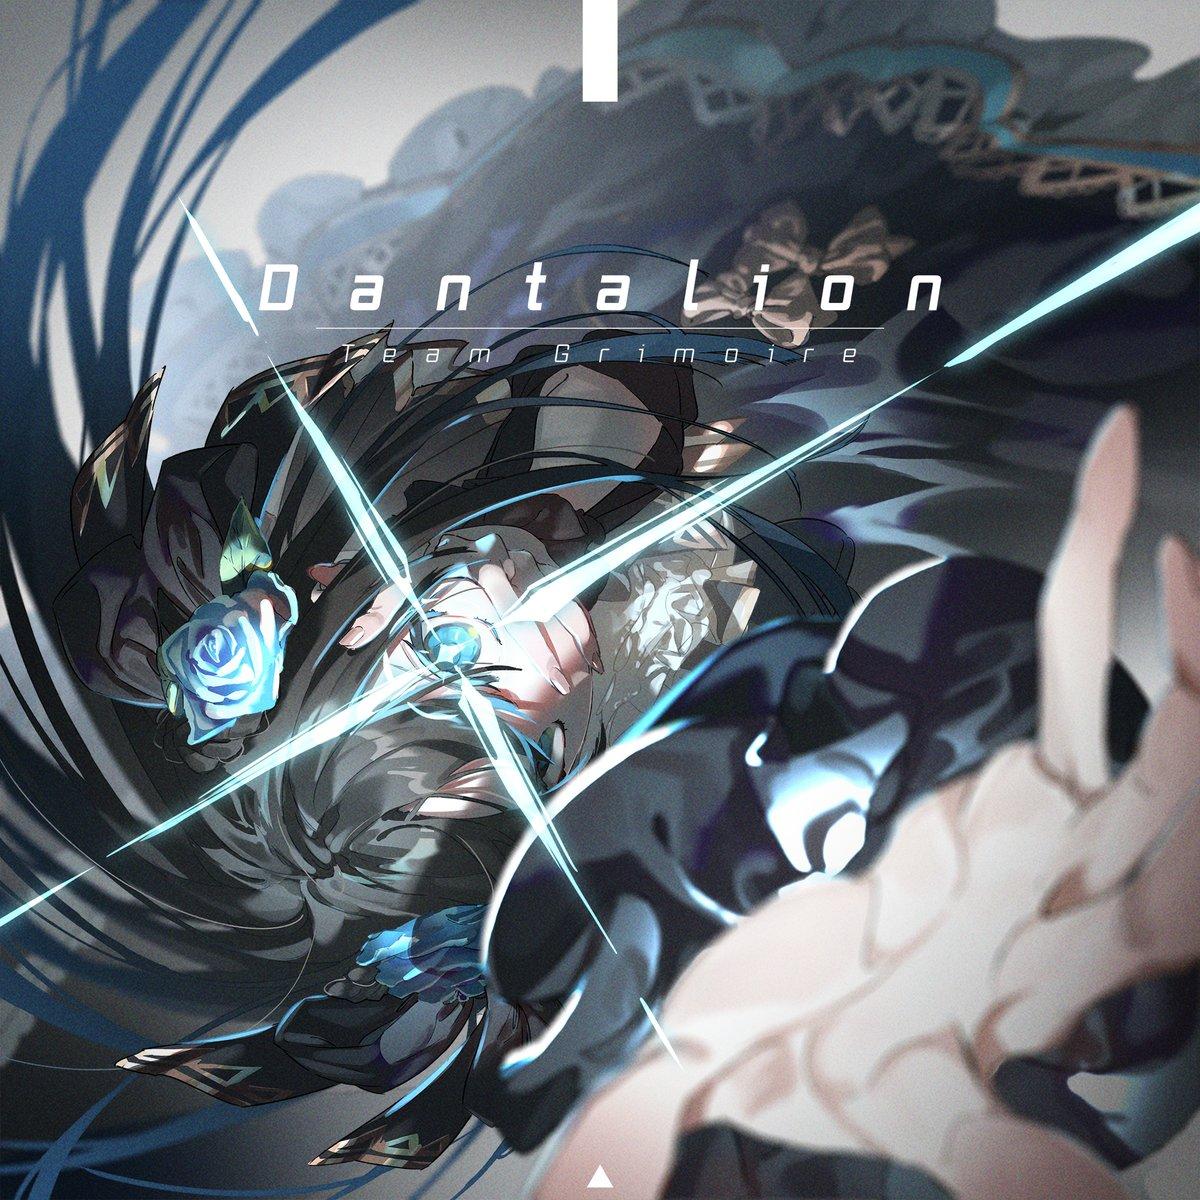 Dantalion